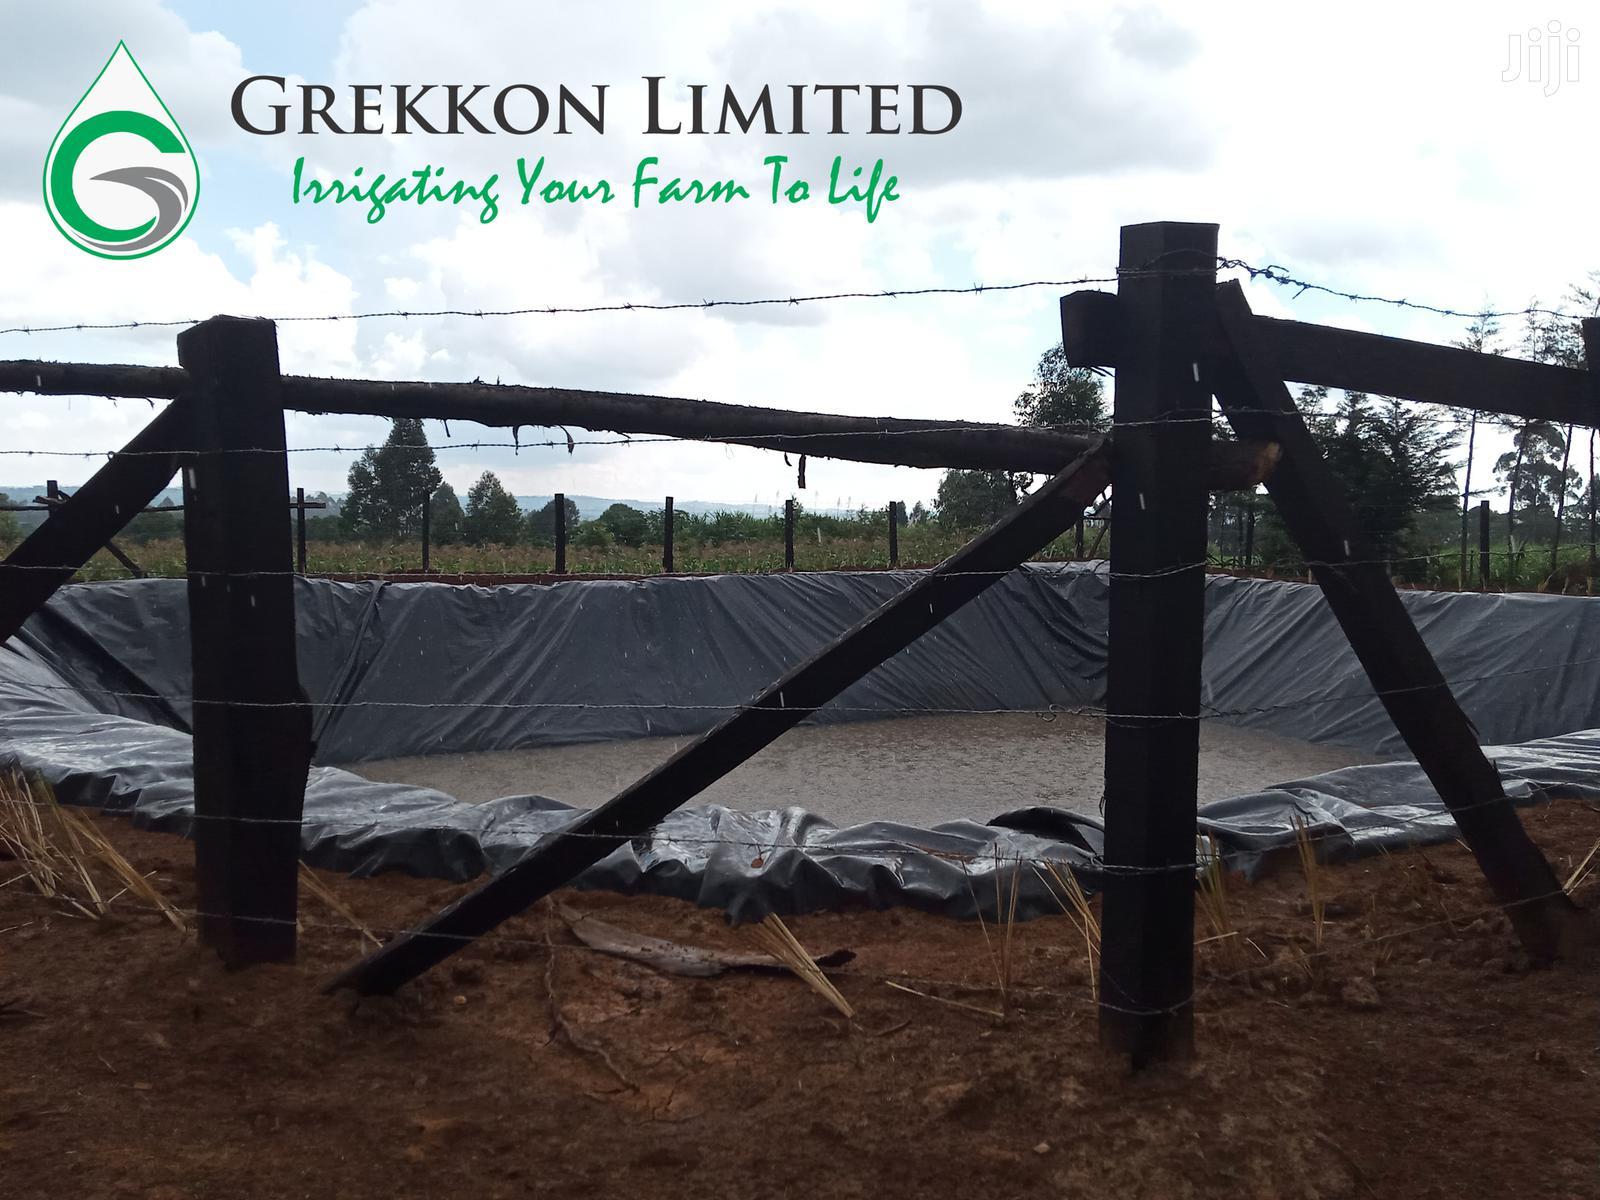 Dam Liner HDPE Geomembrane For Sale In Kenya | Farm Machinery & Equipment for sale in Langas, Uasin Gishu, Kenya